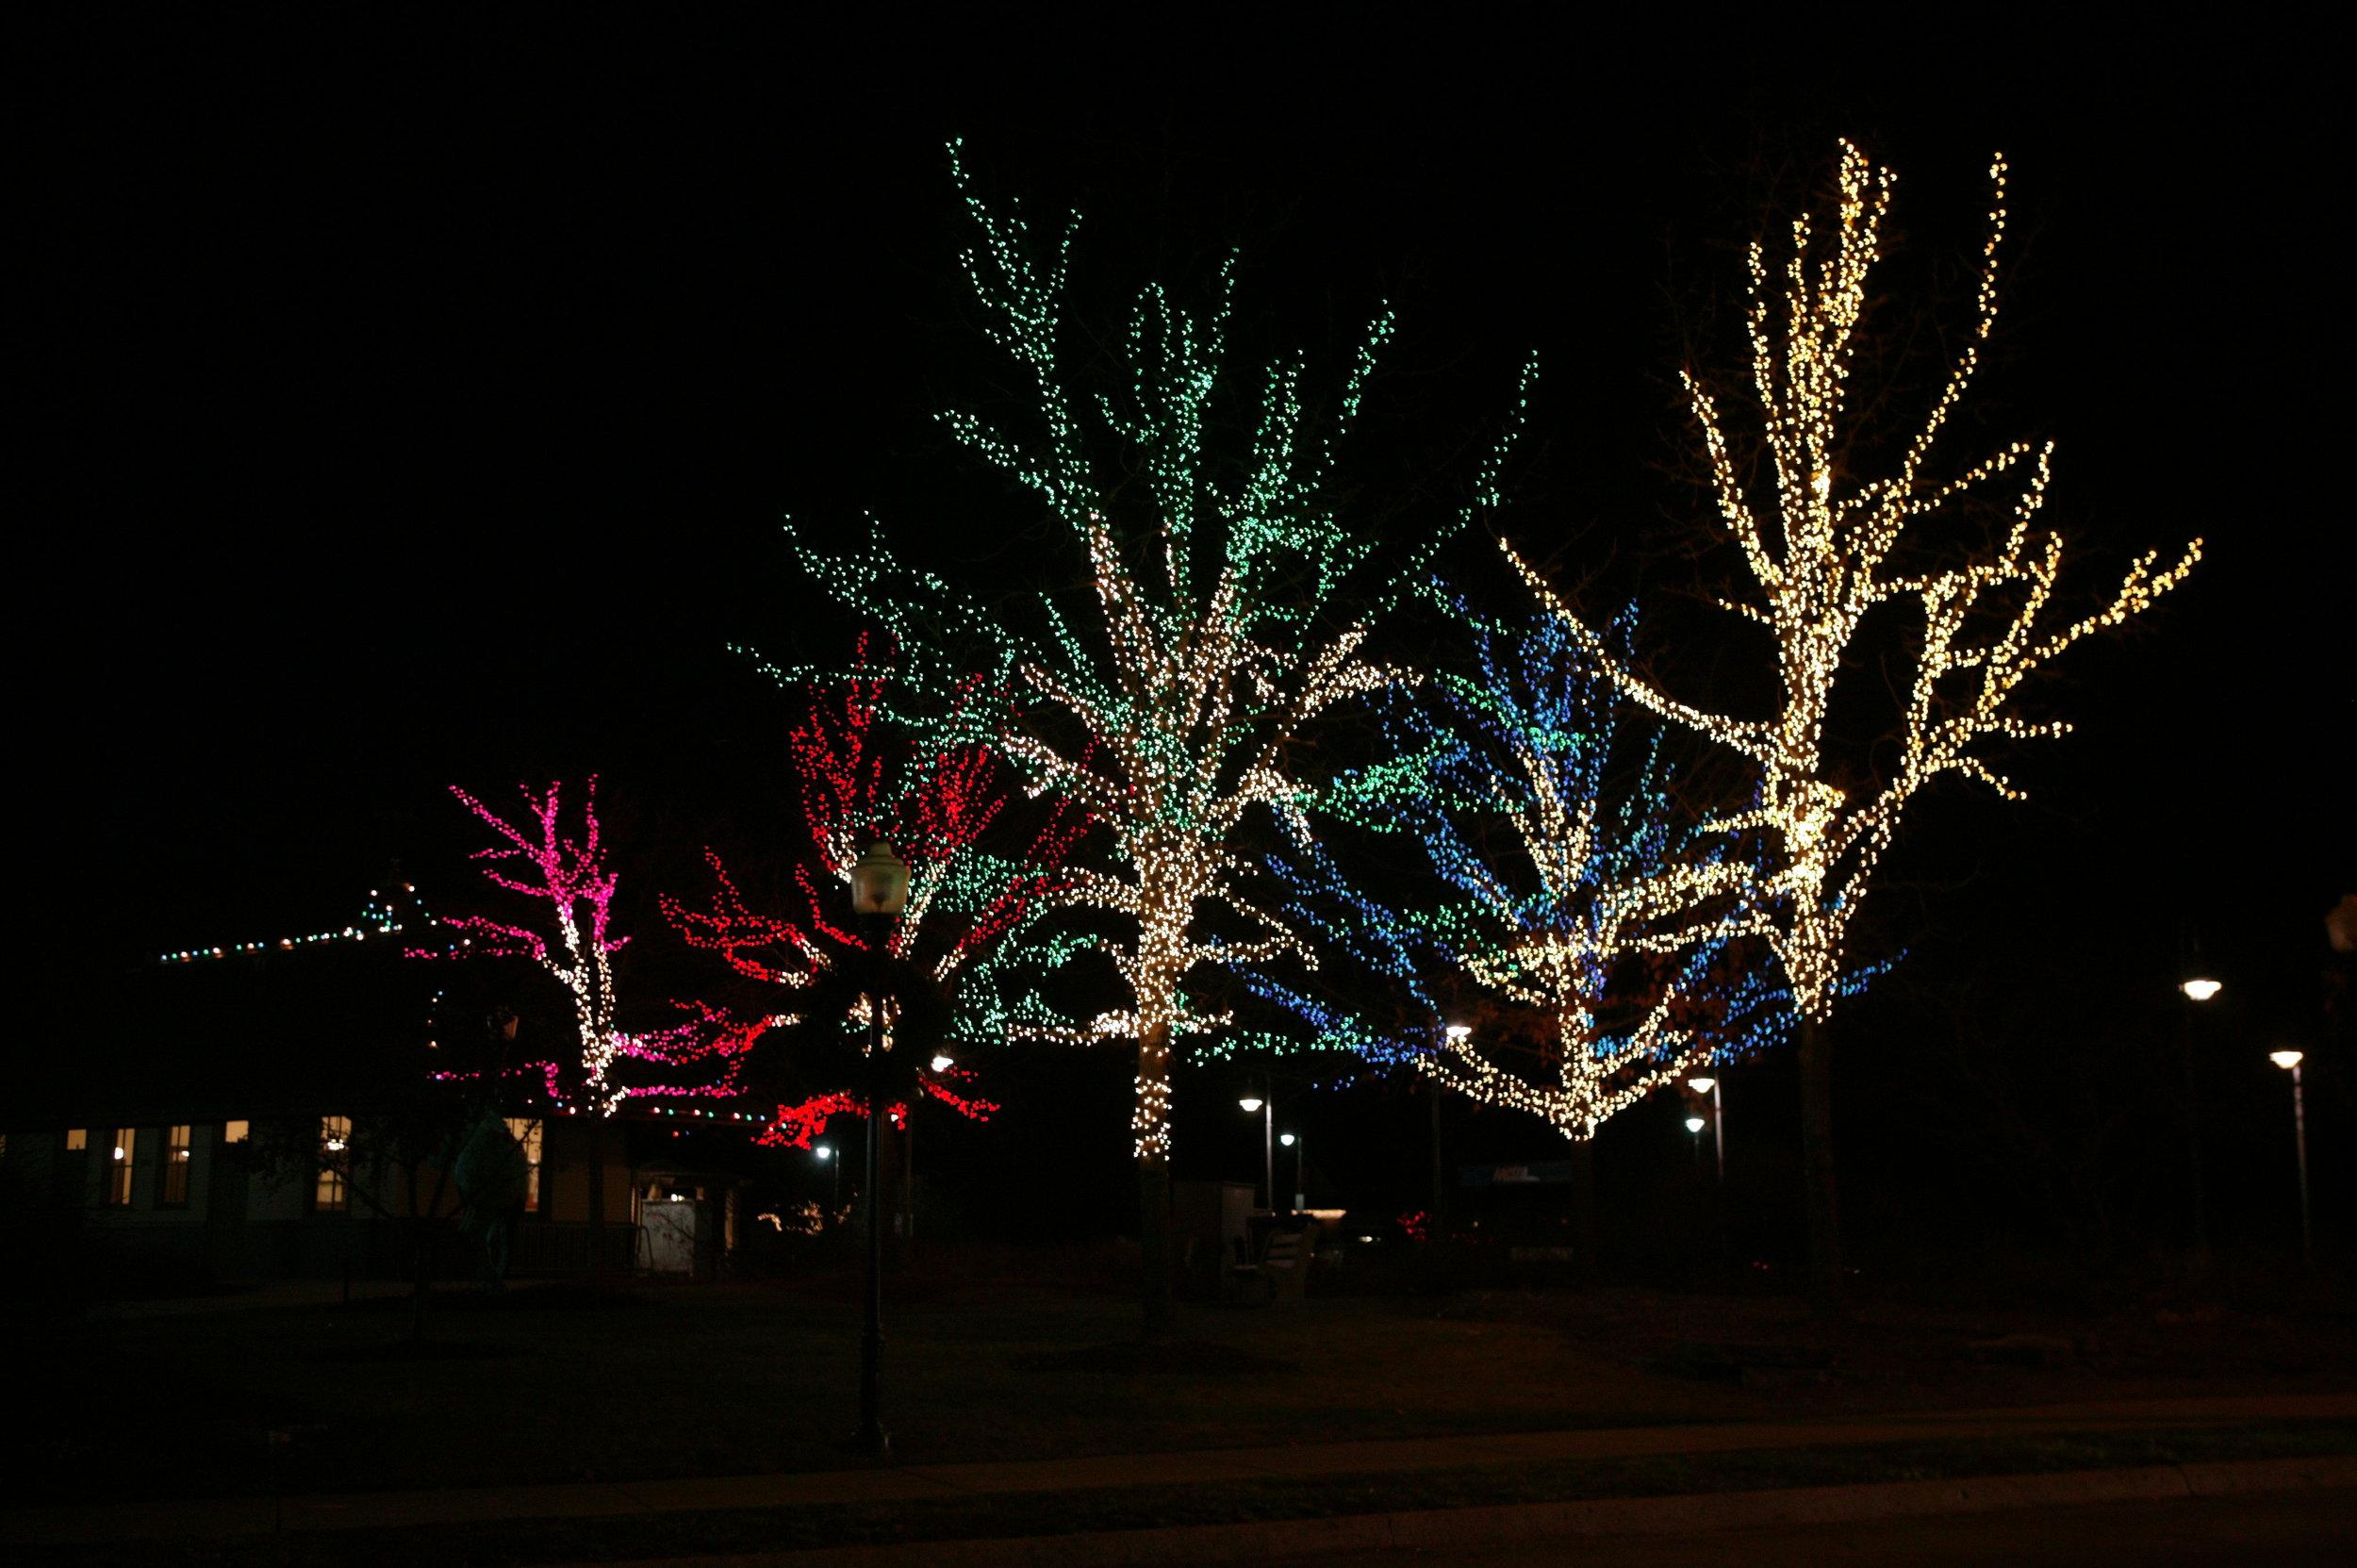 lights.2 066.jpg